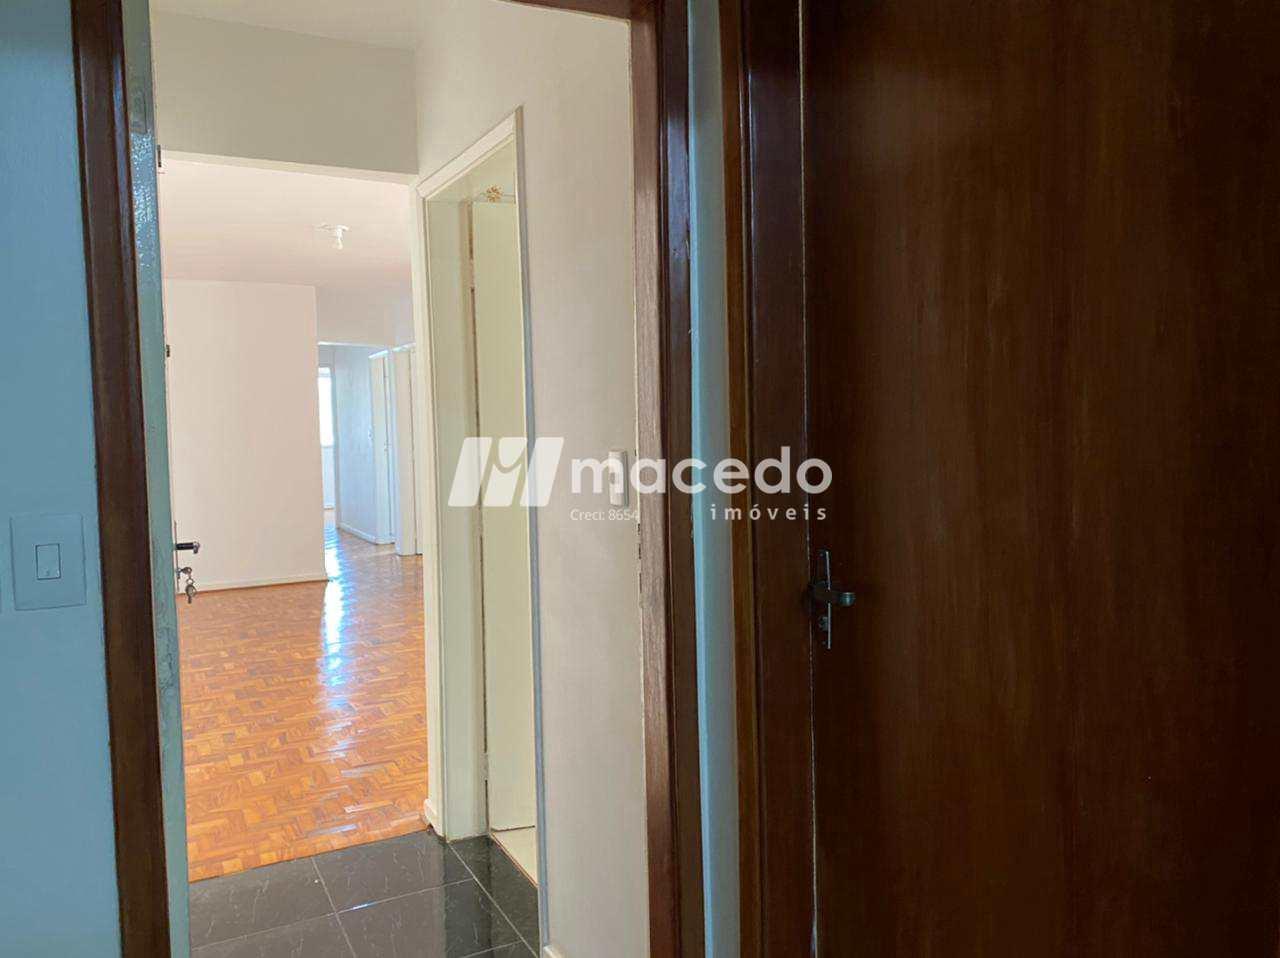 Apto Duplex 2 dorms Perdizes, São Paulo - R$ 470 mil, Cod: 5655